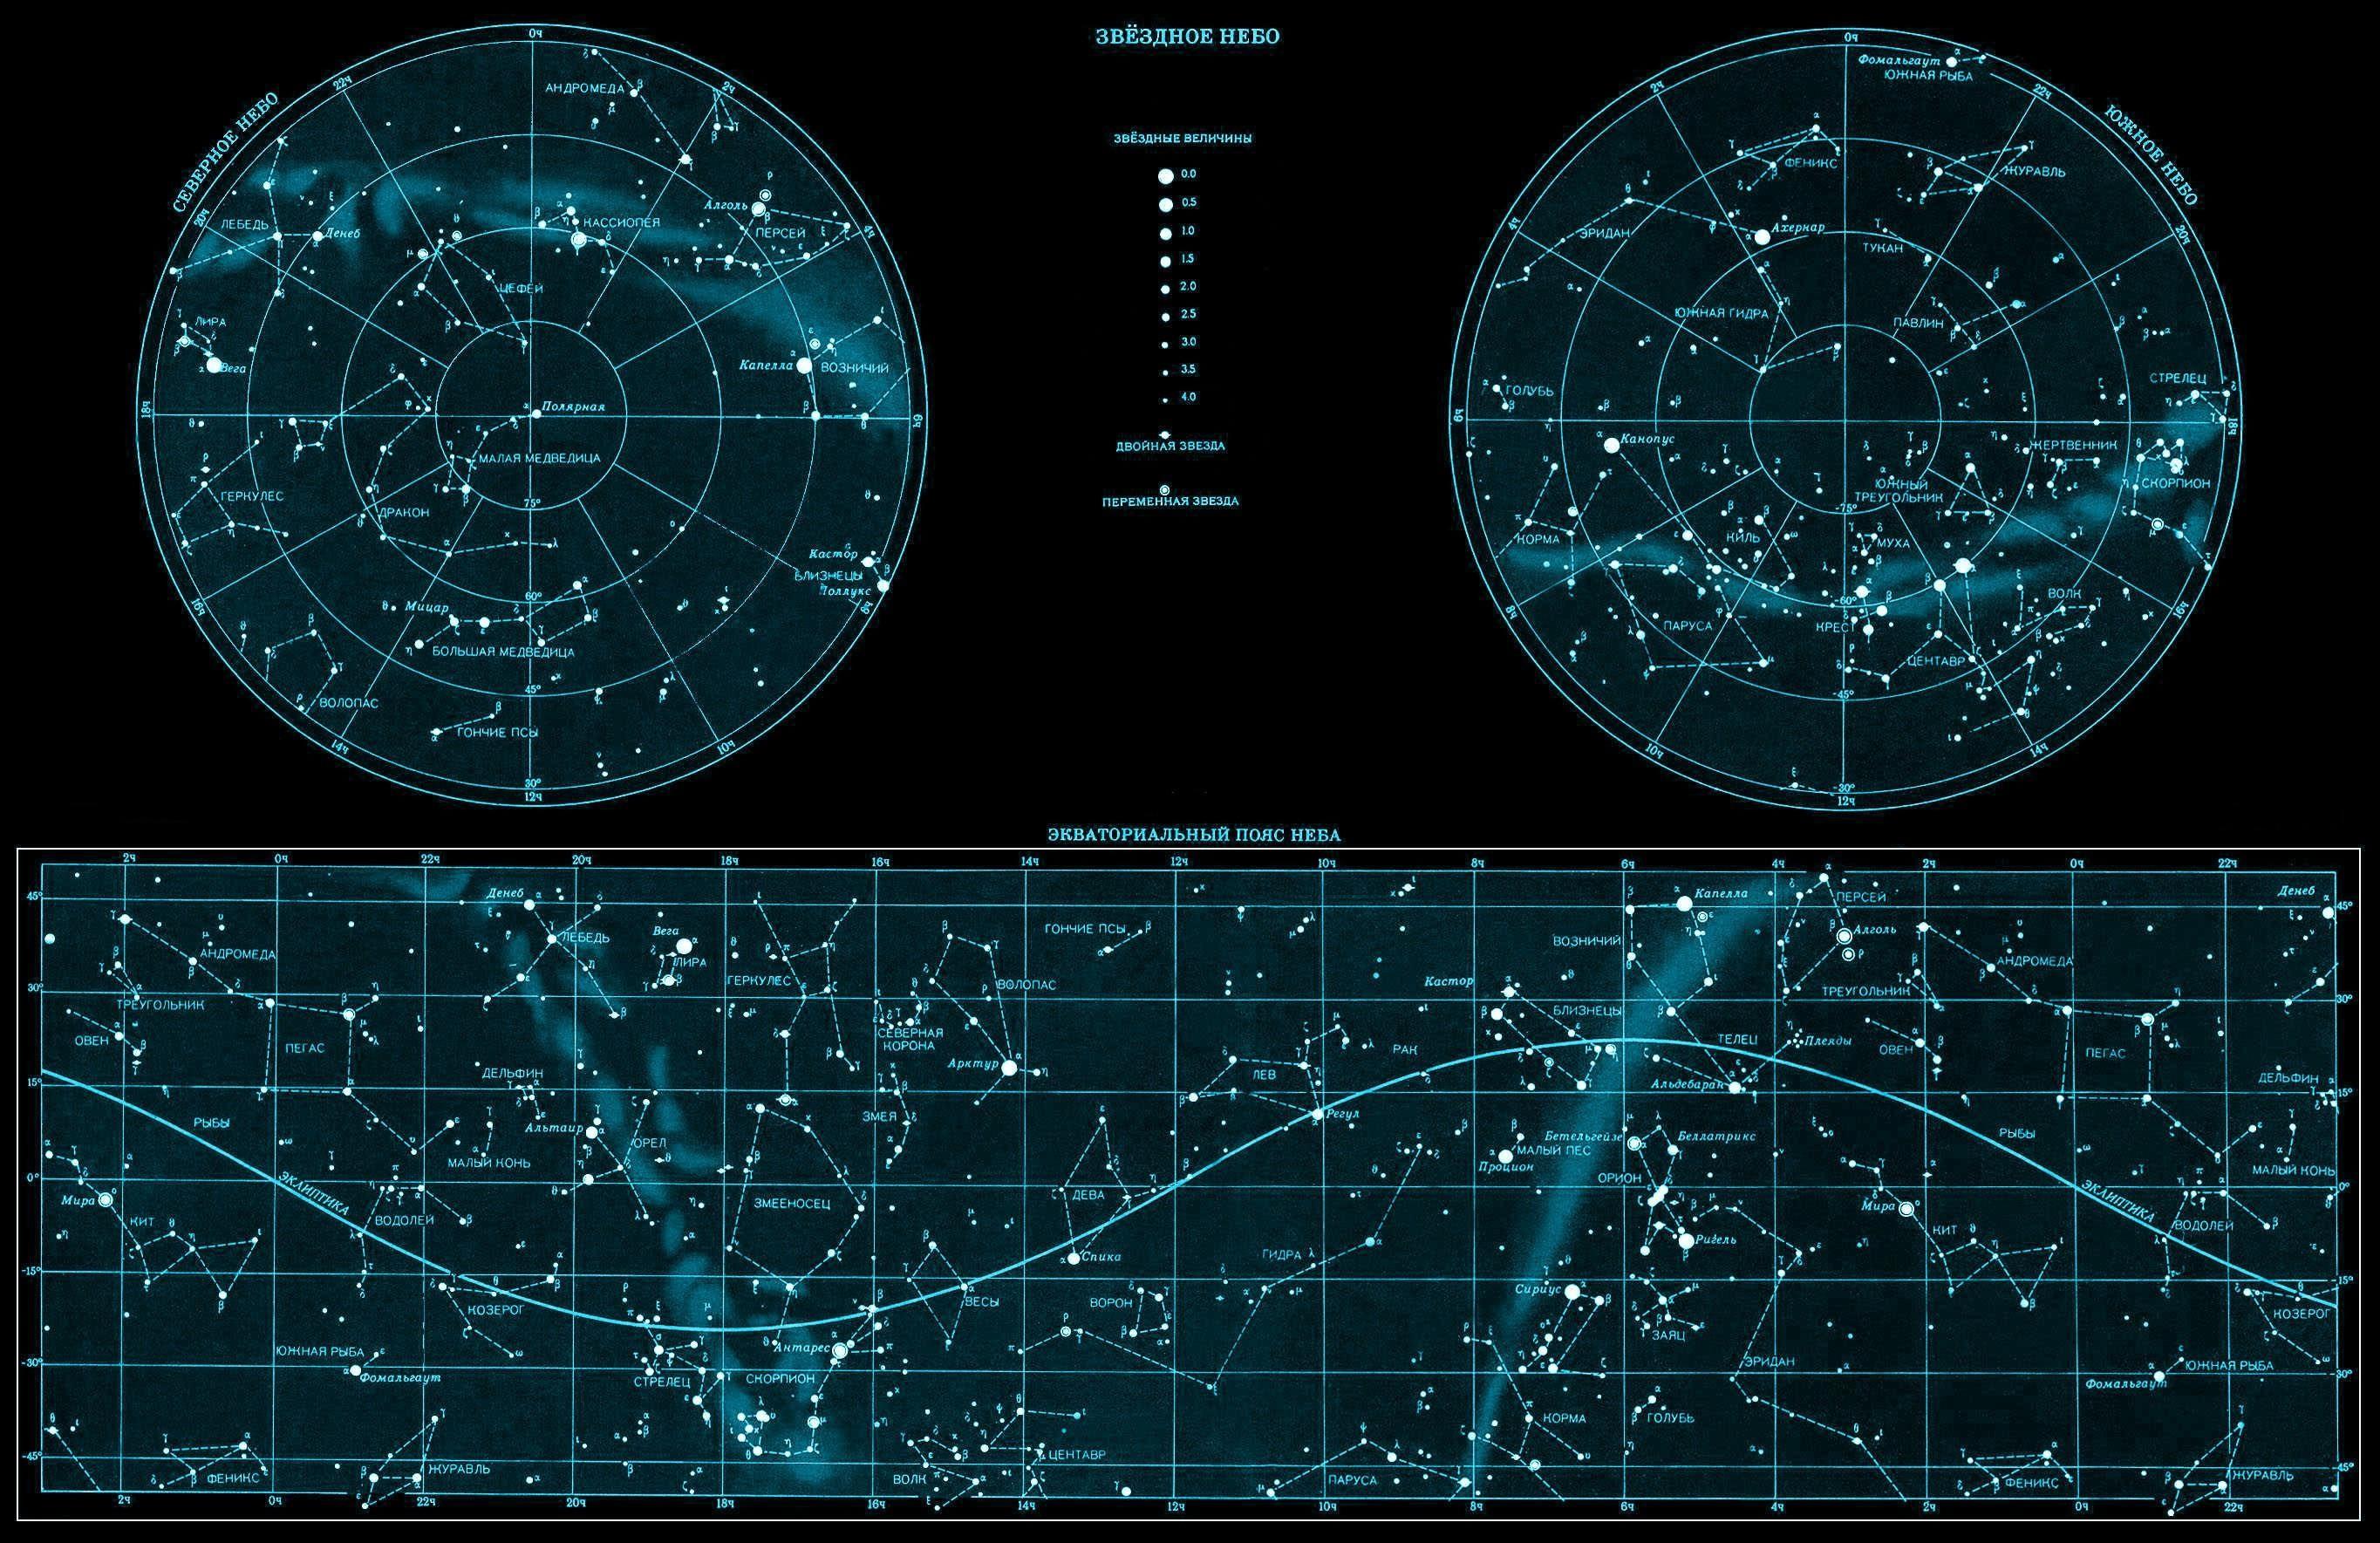 Stars Space Sky Map Phone wallpaper thumb